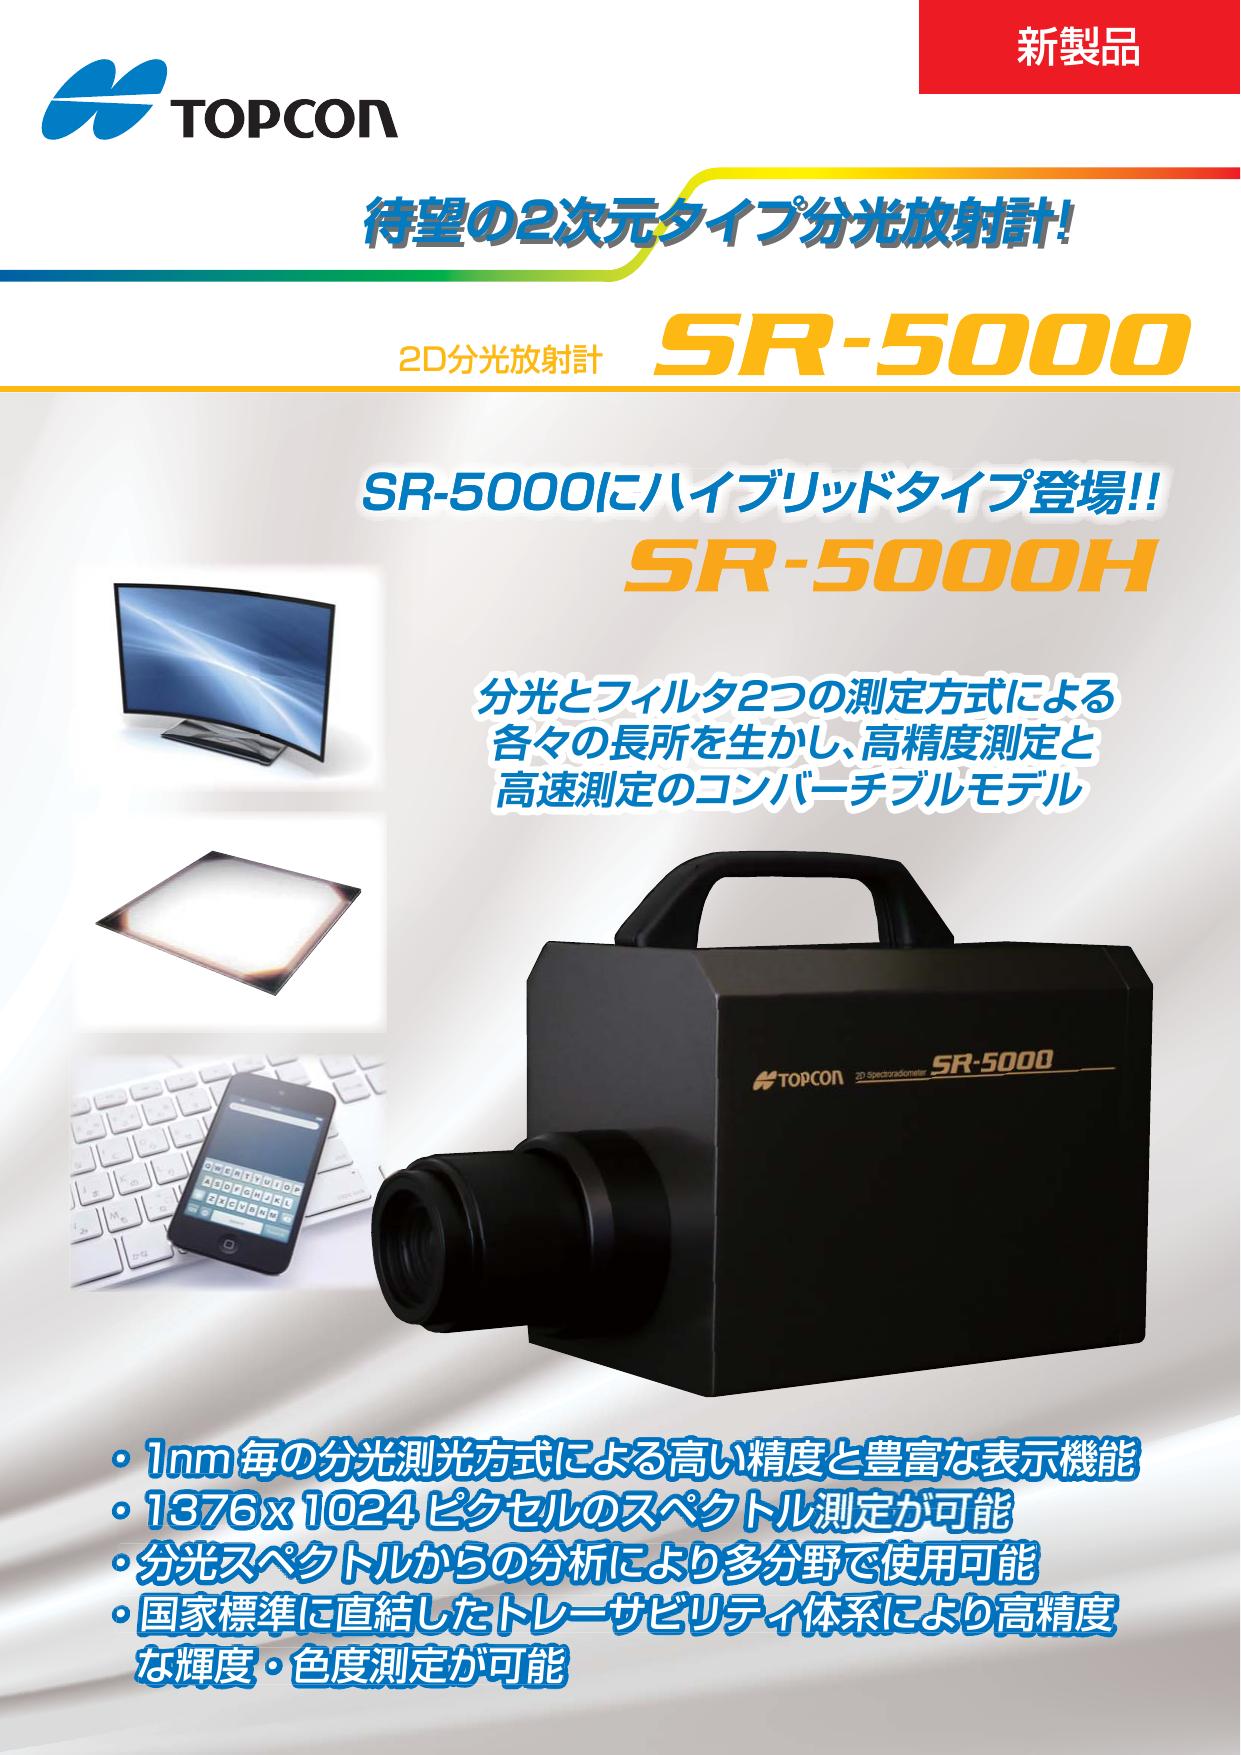 2D分光放射計 SR-5000/SR-5000H